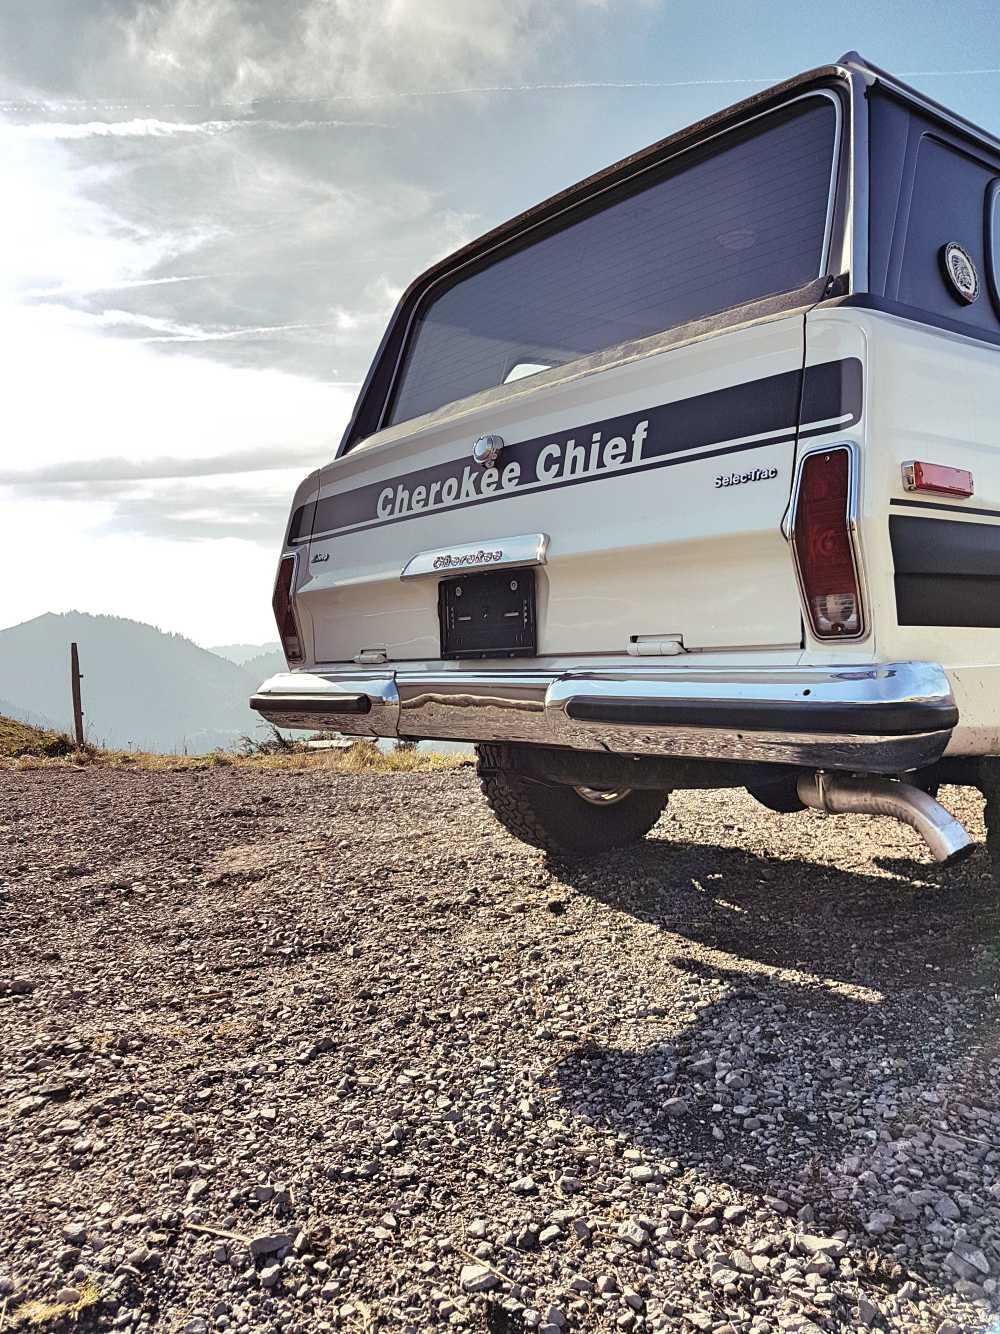 jeep-cherokee-chief-1978-shooting-moleson-27